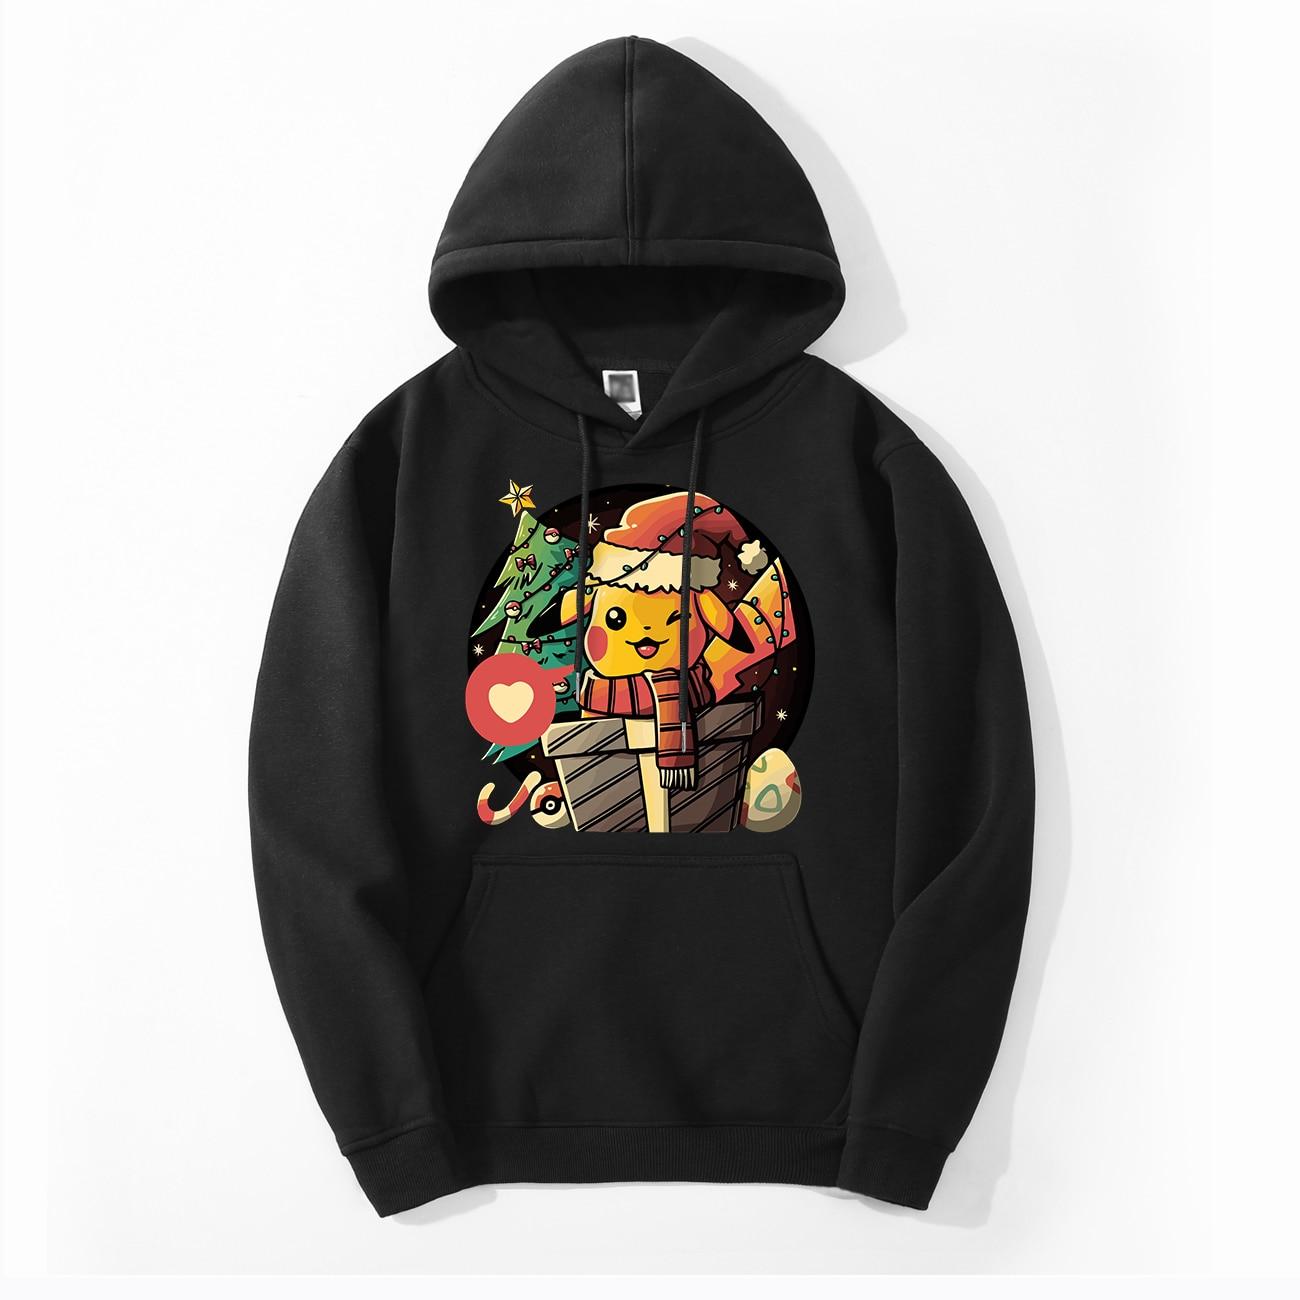 Pokemon Pikachu Men's Hoodies Spring Autumn Merry Christmas Hoodies Sweatshirts Men Fleece Tops Pokemon Cute Hoodies Sweatshirt